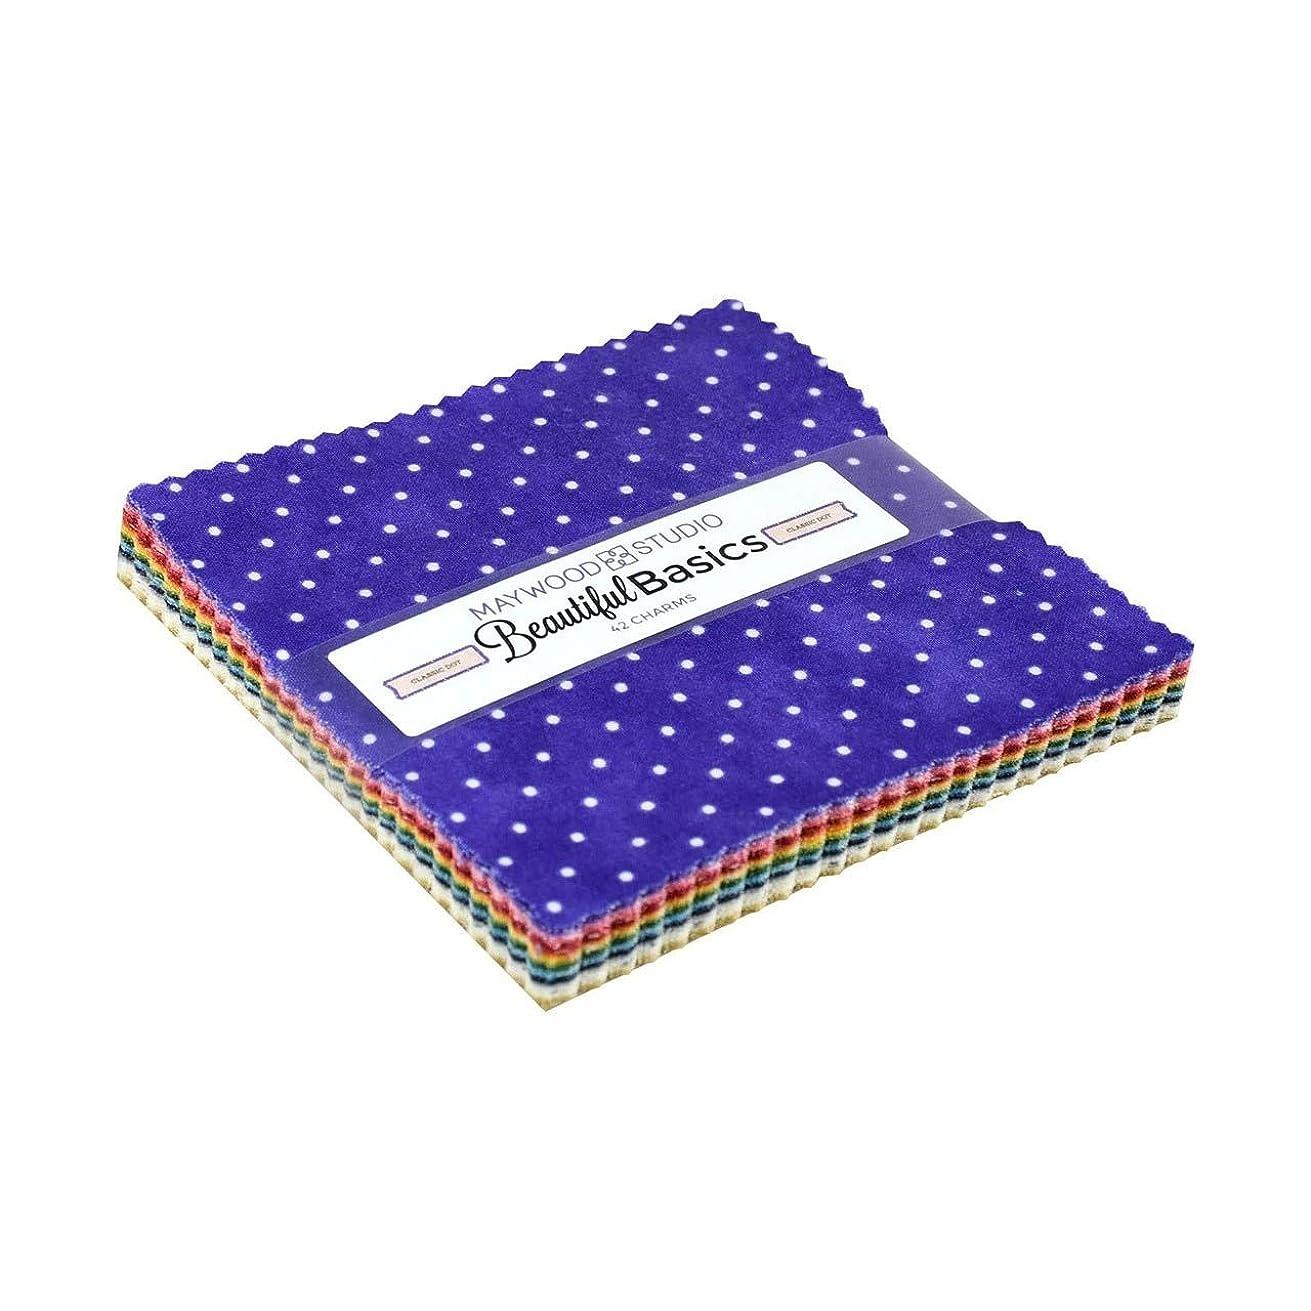 Beautiful Basics Classic Dot Charm Pack 42 5-inch Squares Maywood Studio